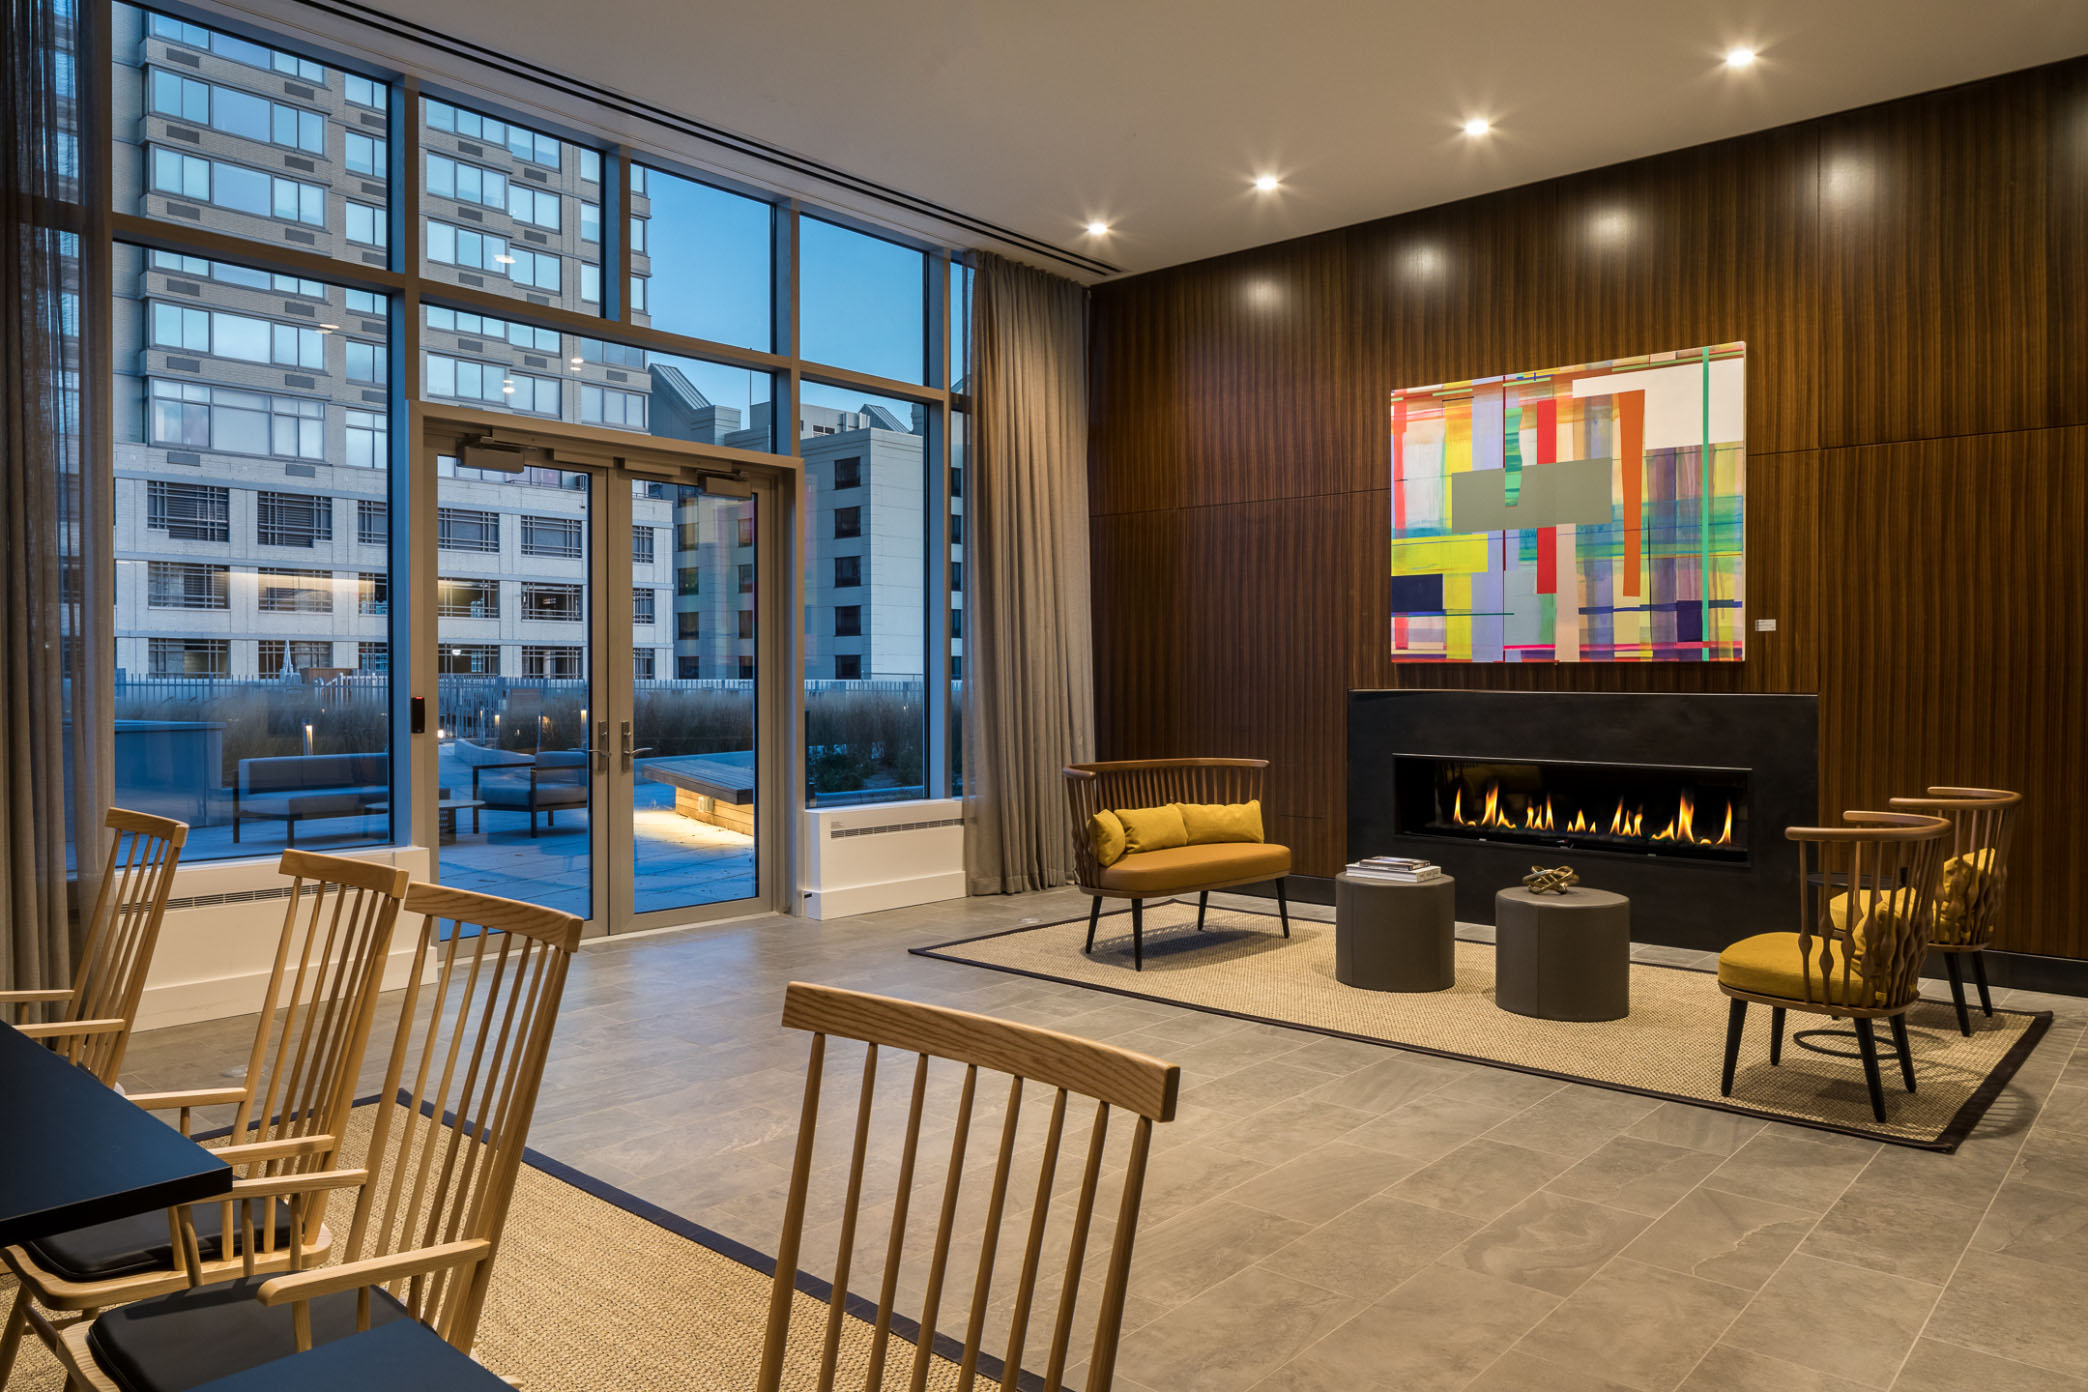 Fireplace-Artwork-Lounge